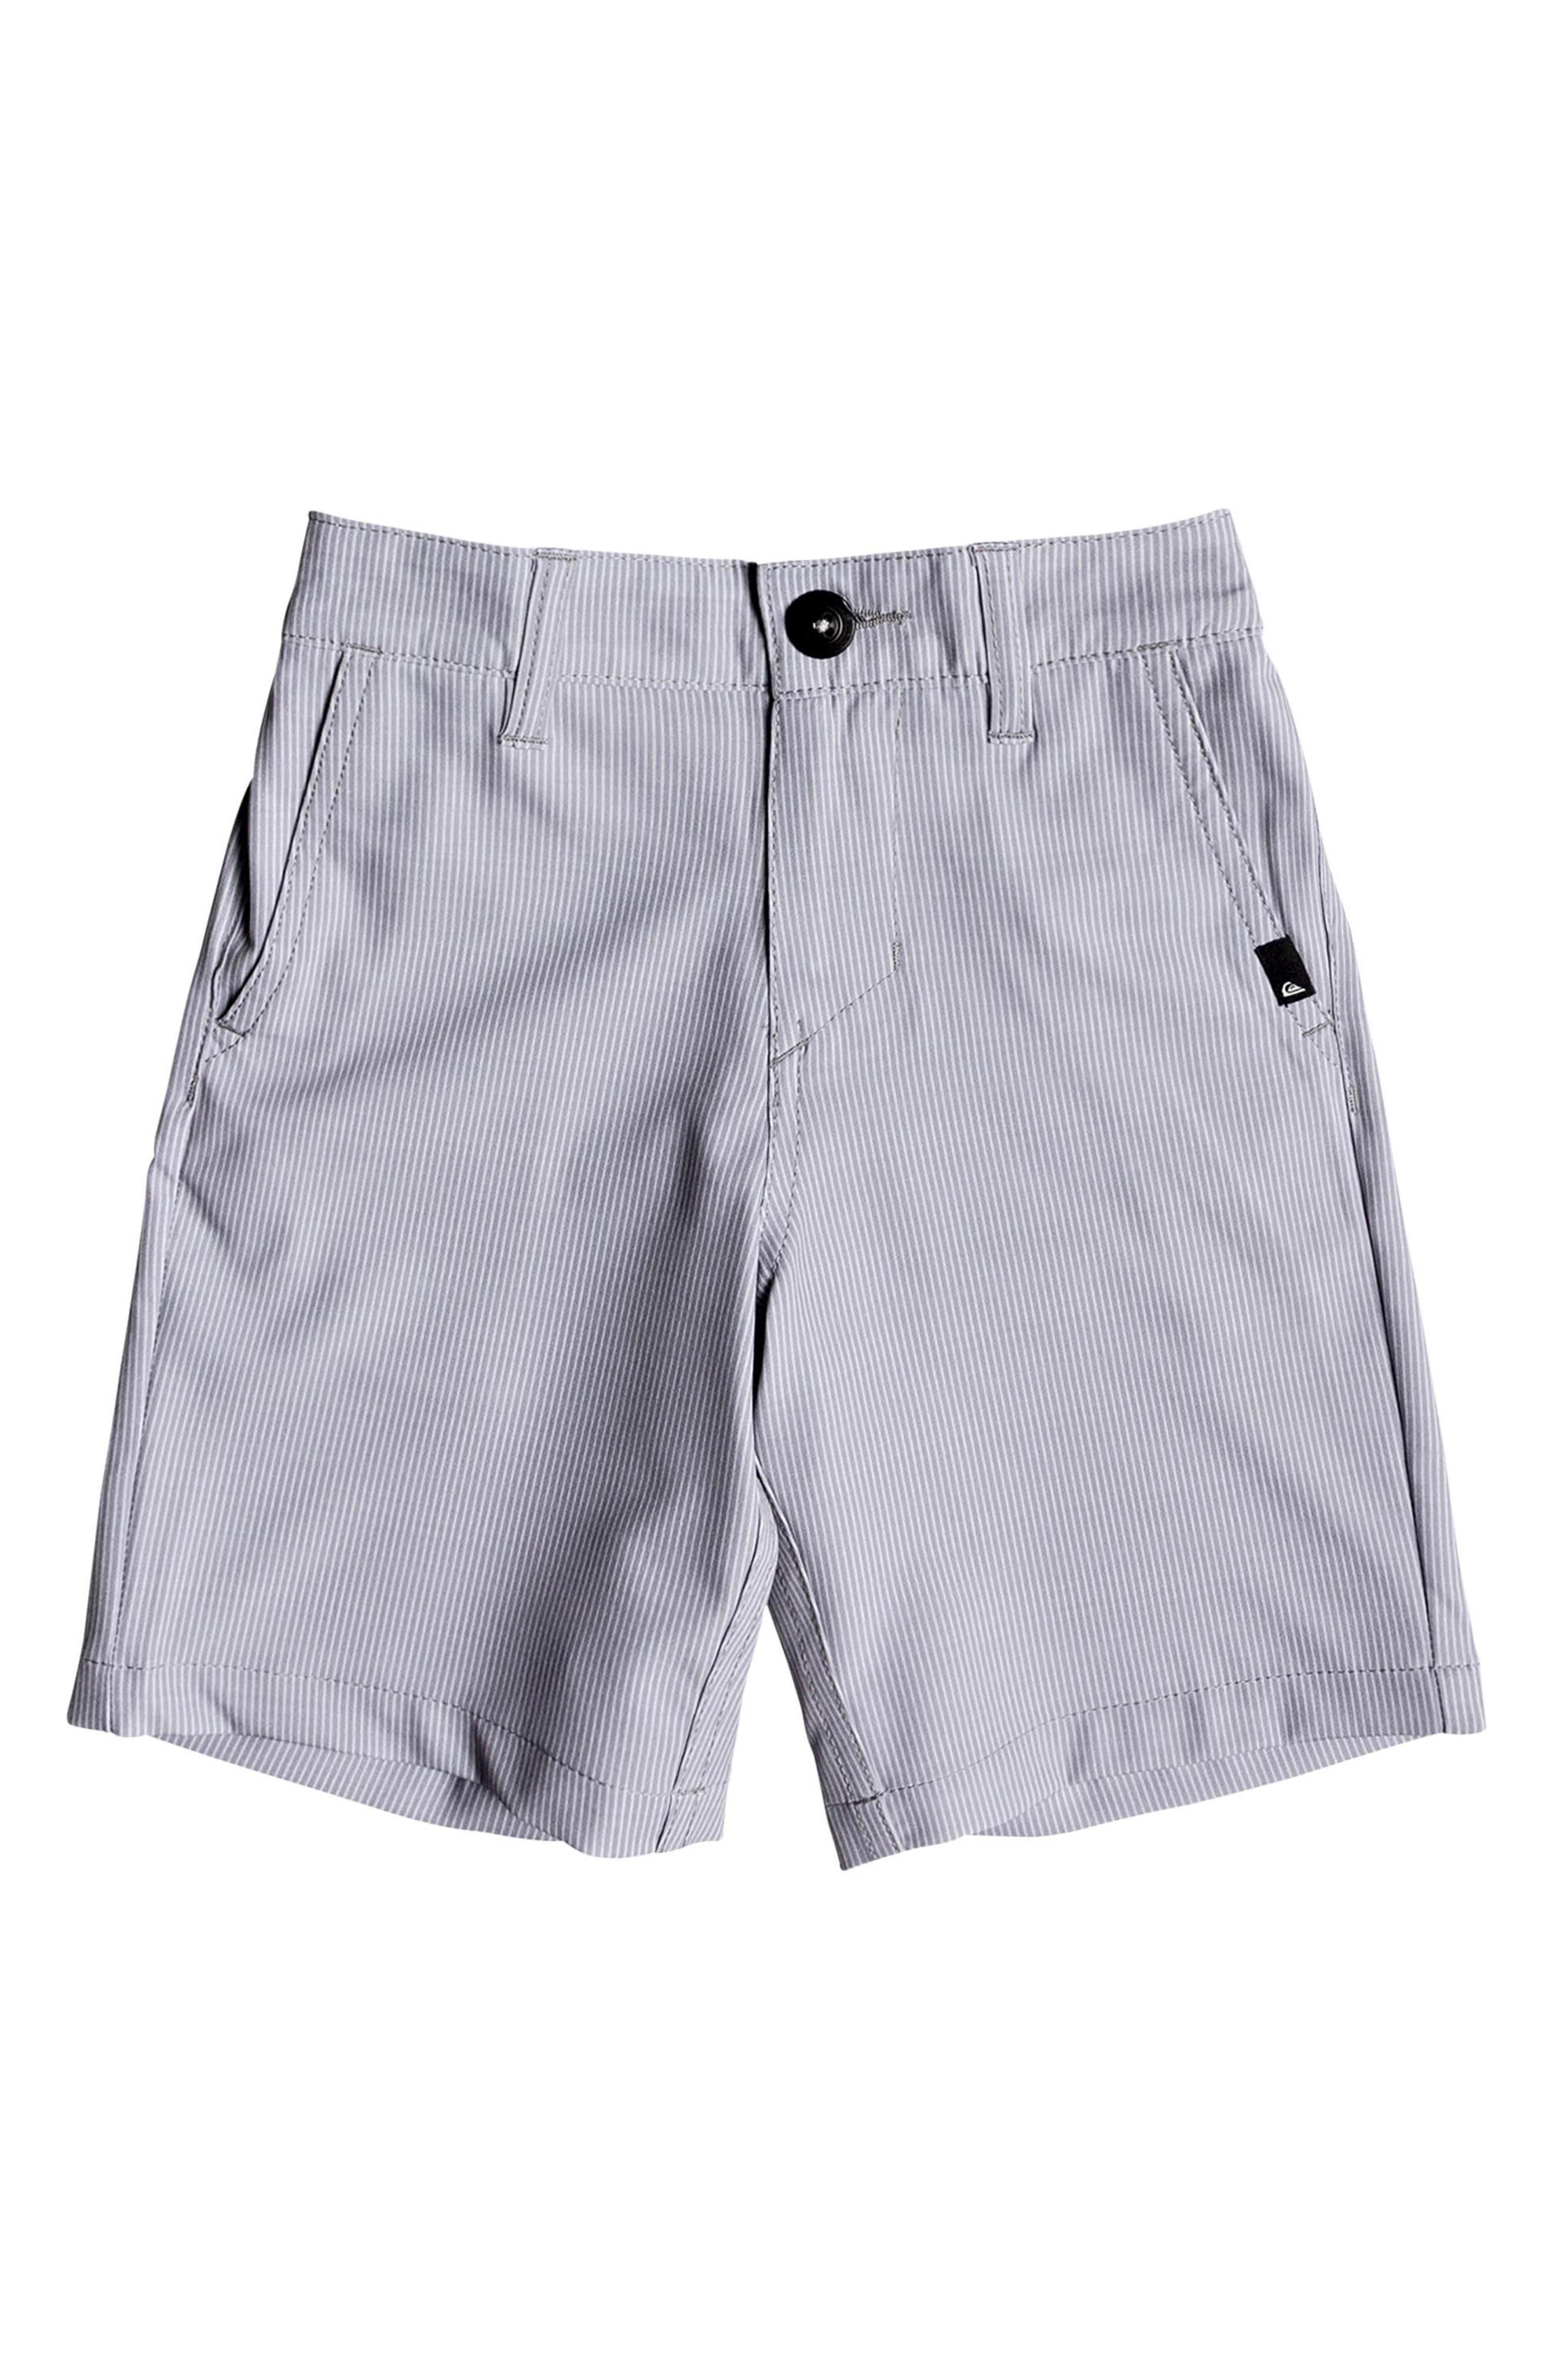 Union Pinstripe Amphibian Board Shorts,                         Main,                         color, 031